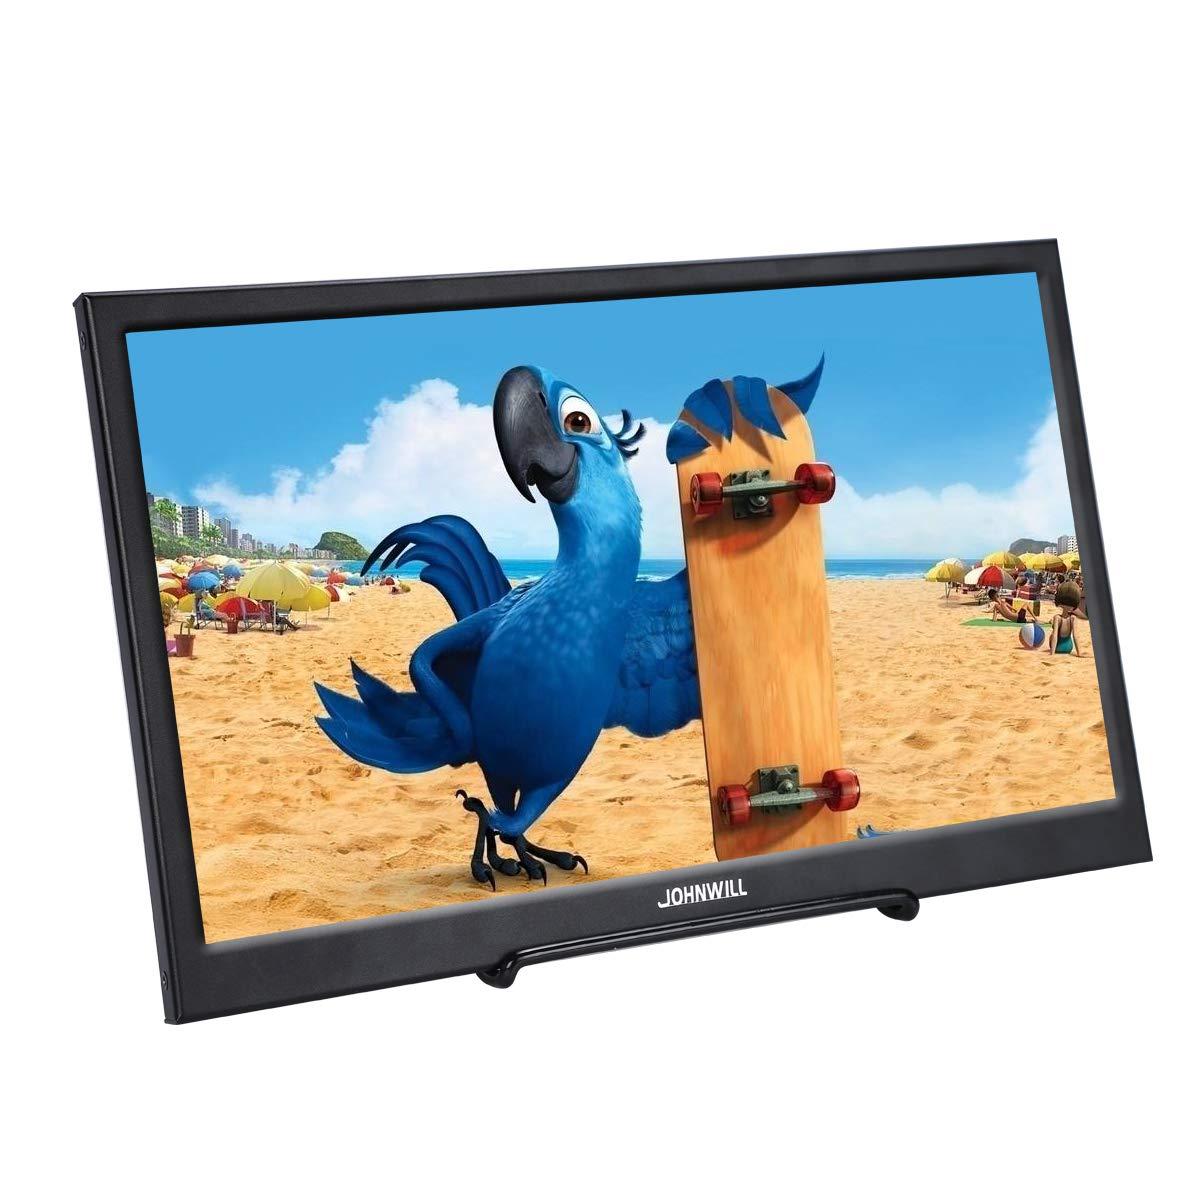 JOHNWILL Monitor portátil IPS Pantalla Full HD 1920 x 1080 Monitor ...